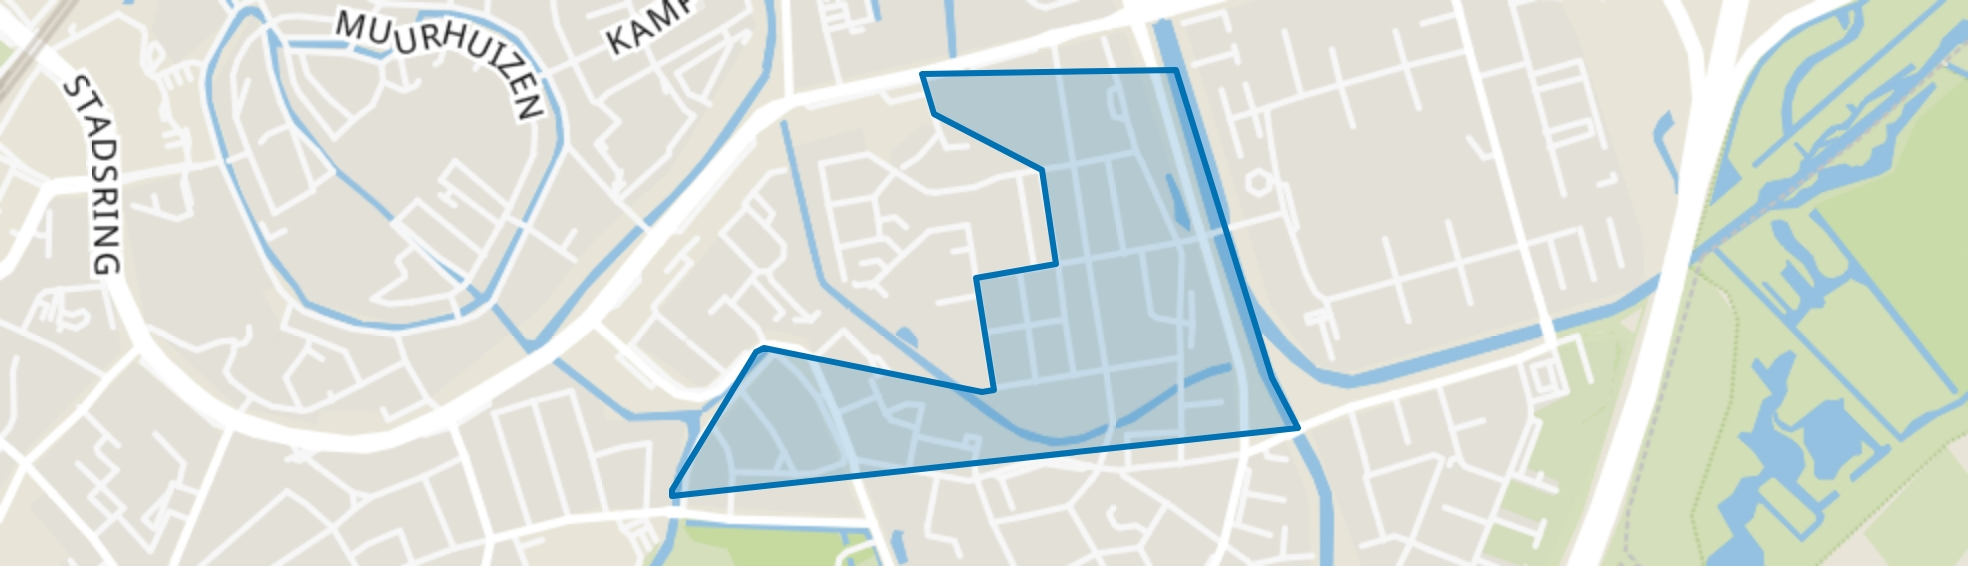 Randenbroekerweg, Amersfoort map